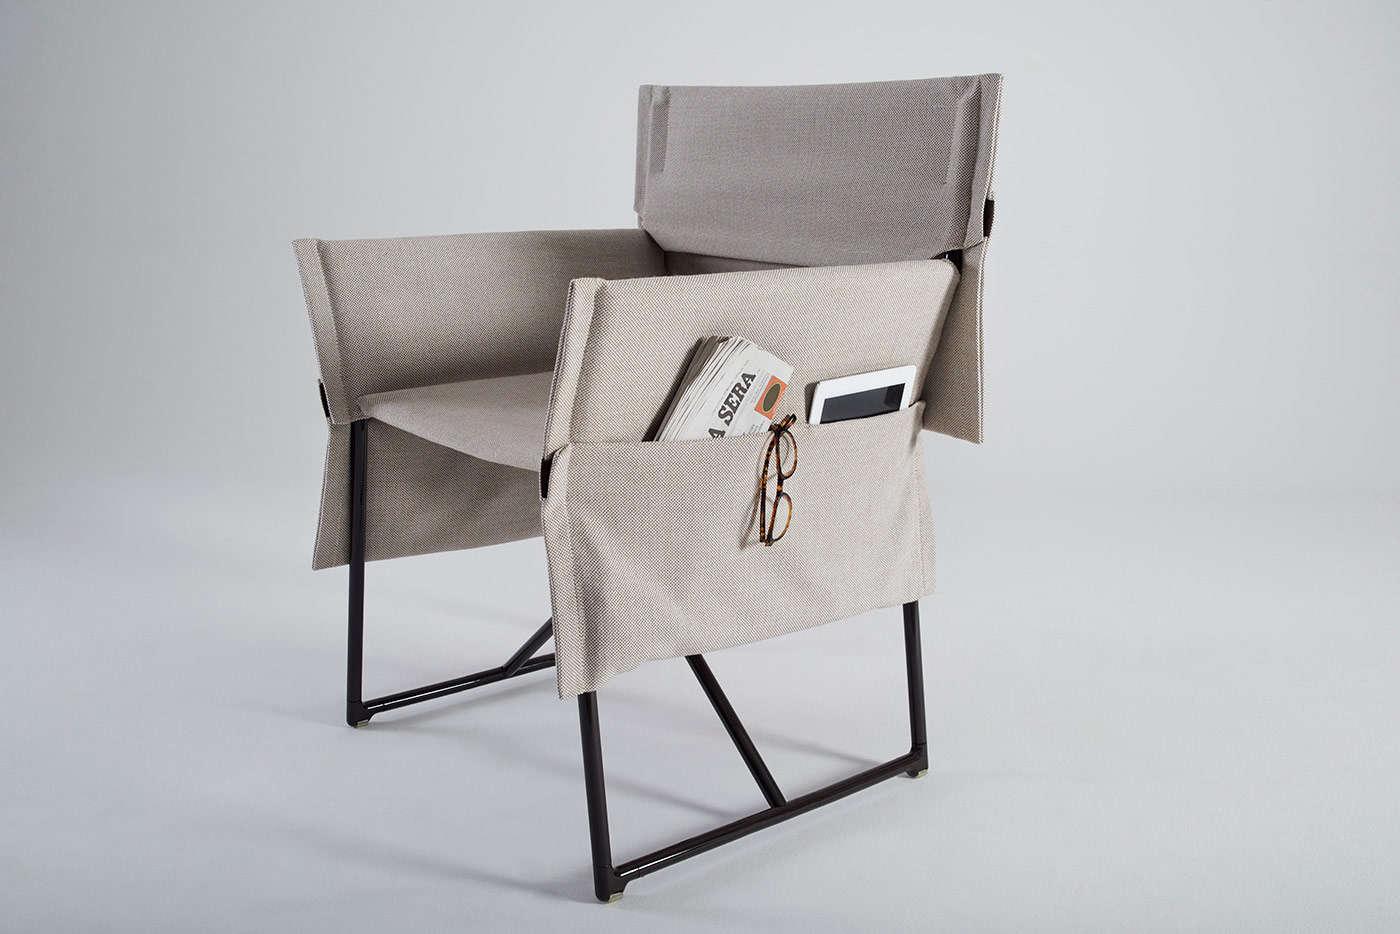 xenia folding chair 12